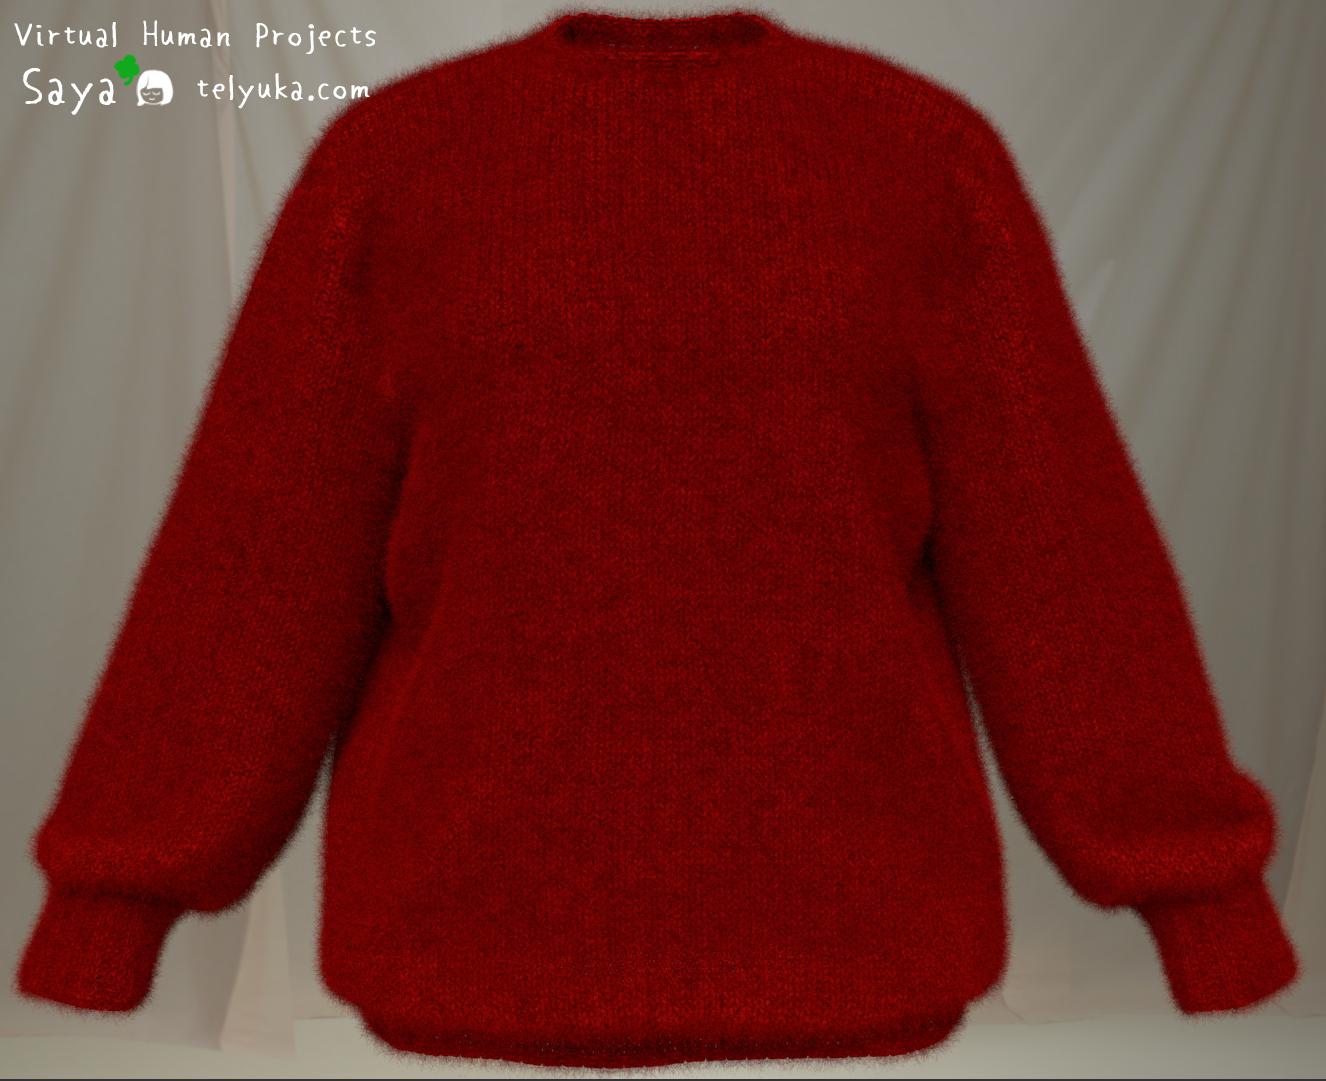 Saya 3d персонаж — визуализация свитера